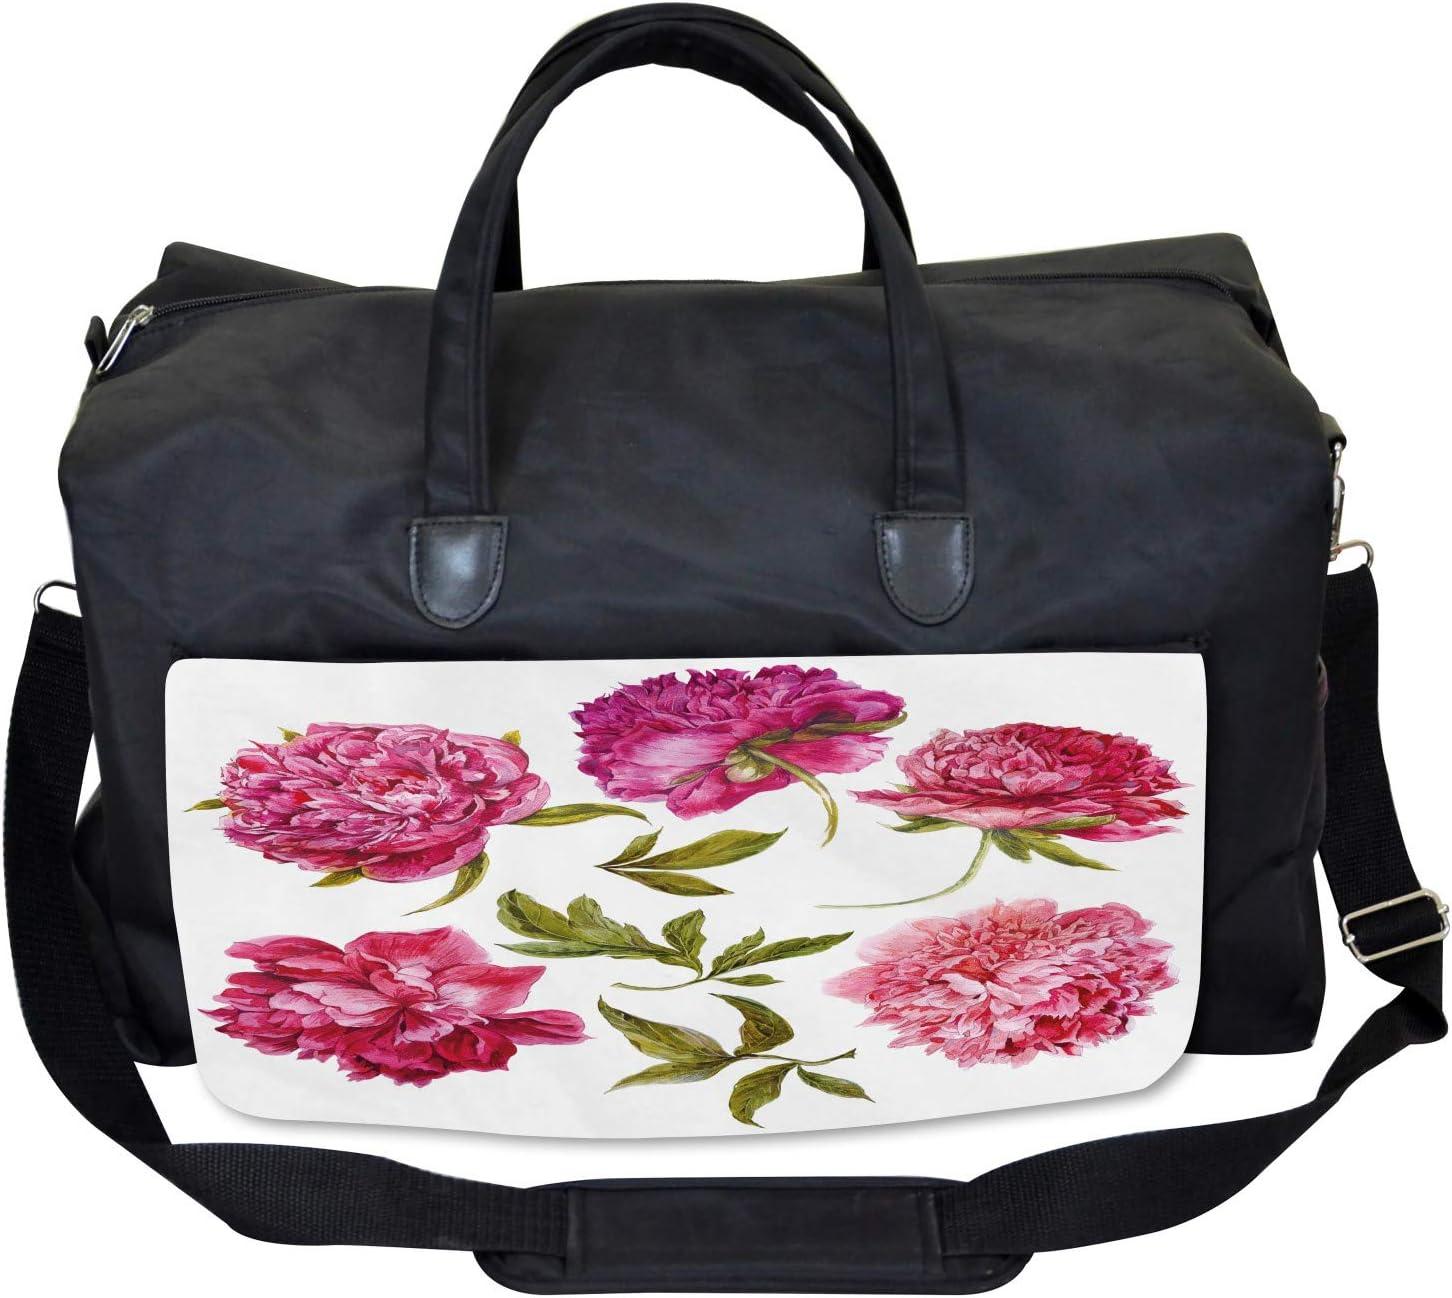 Ambesonne Floral Gym Bag Large Weekender Carry-on Spring Buds Vivid Tones